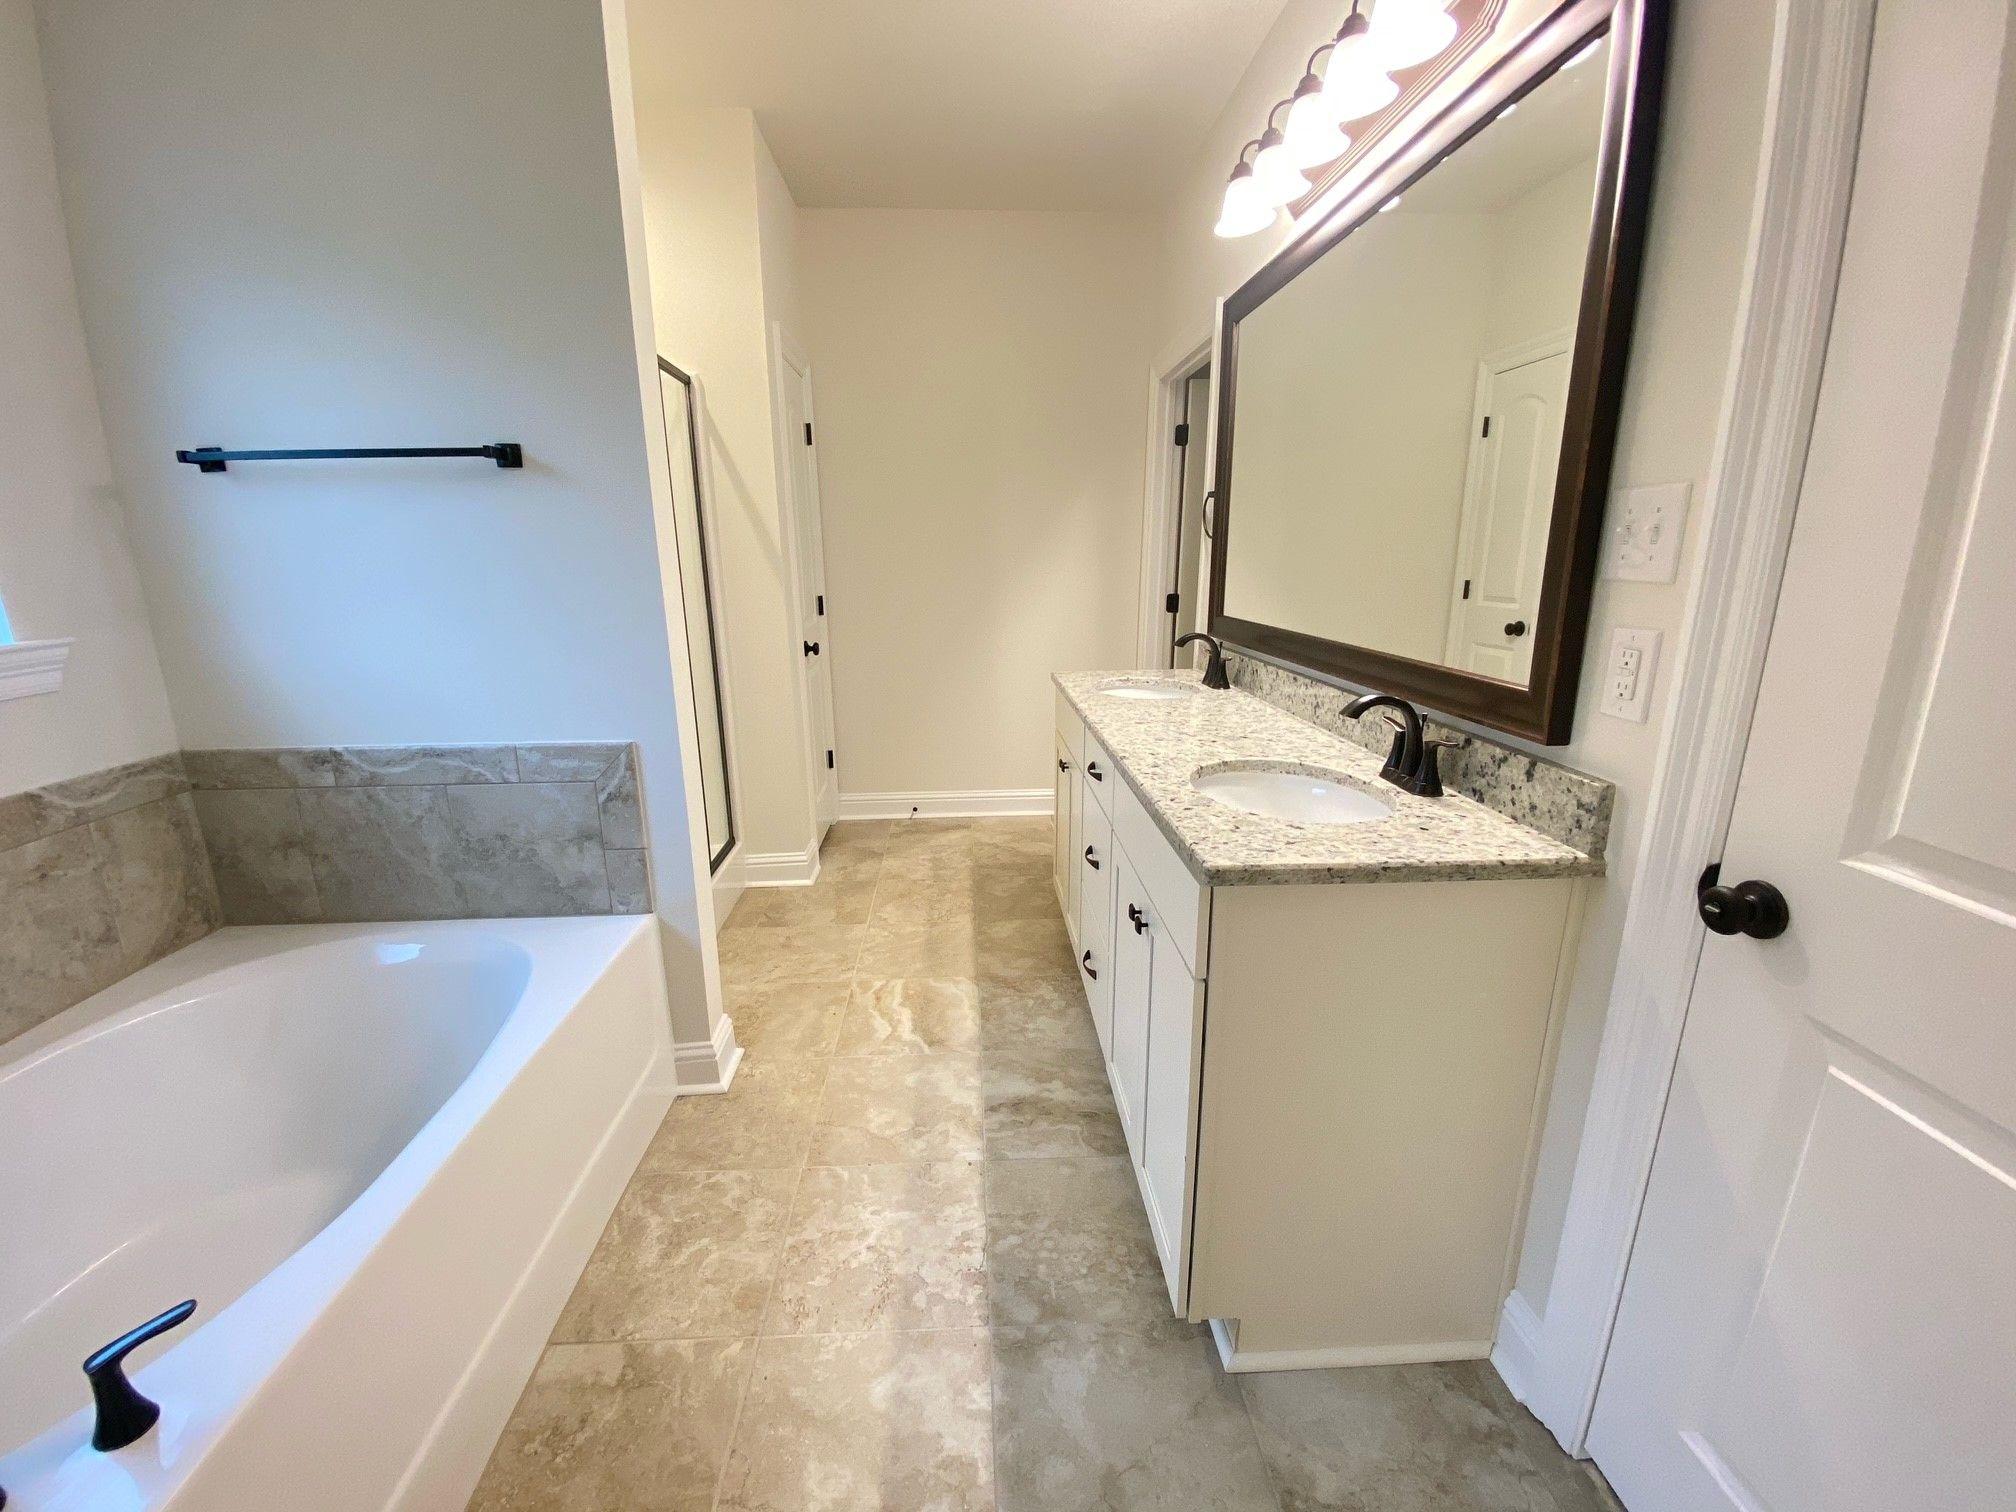 Bathroom featured in the Rousseau II B By DSLD Homes - Louisiana in Baton Rouge, LA